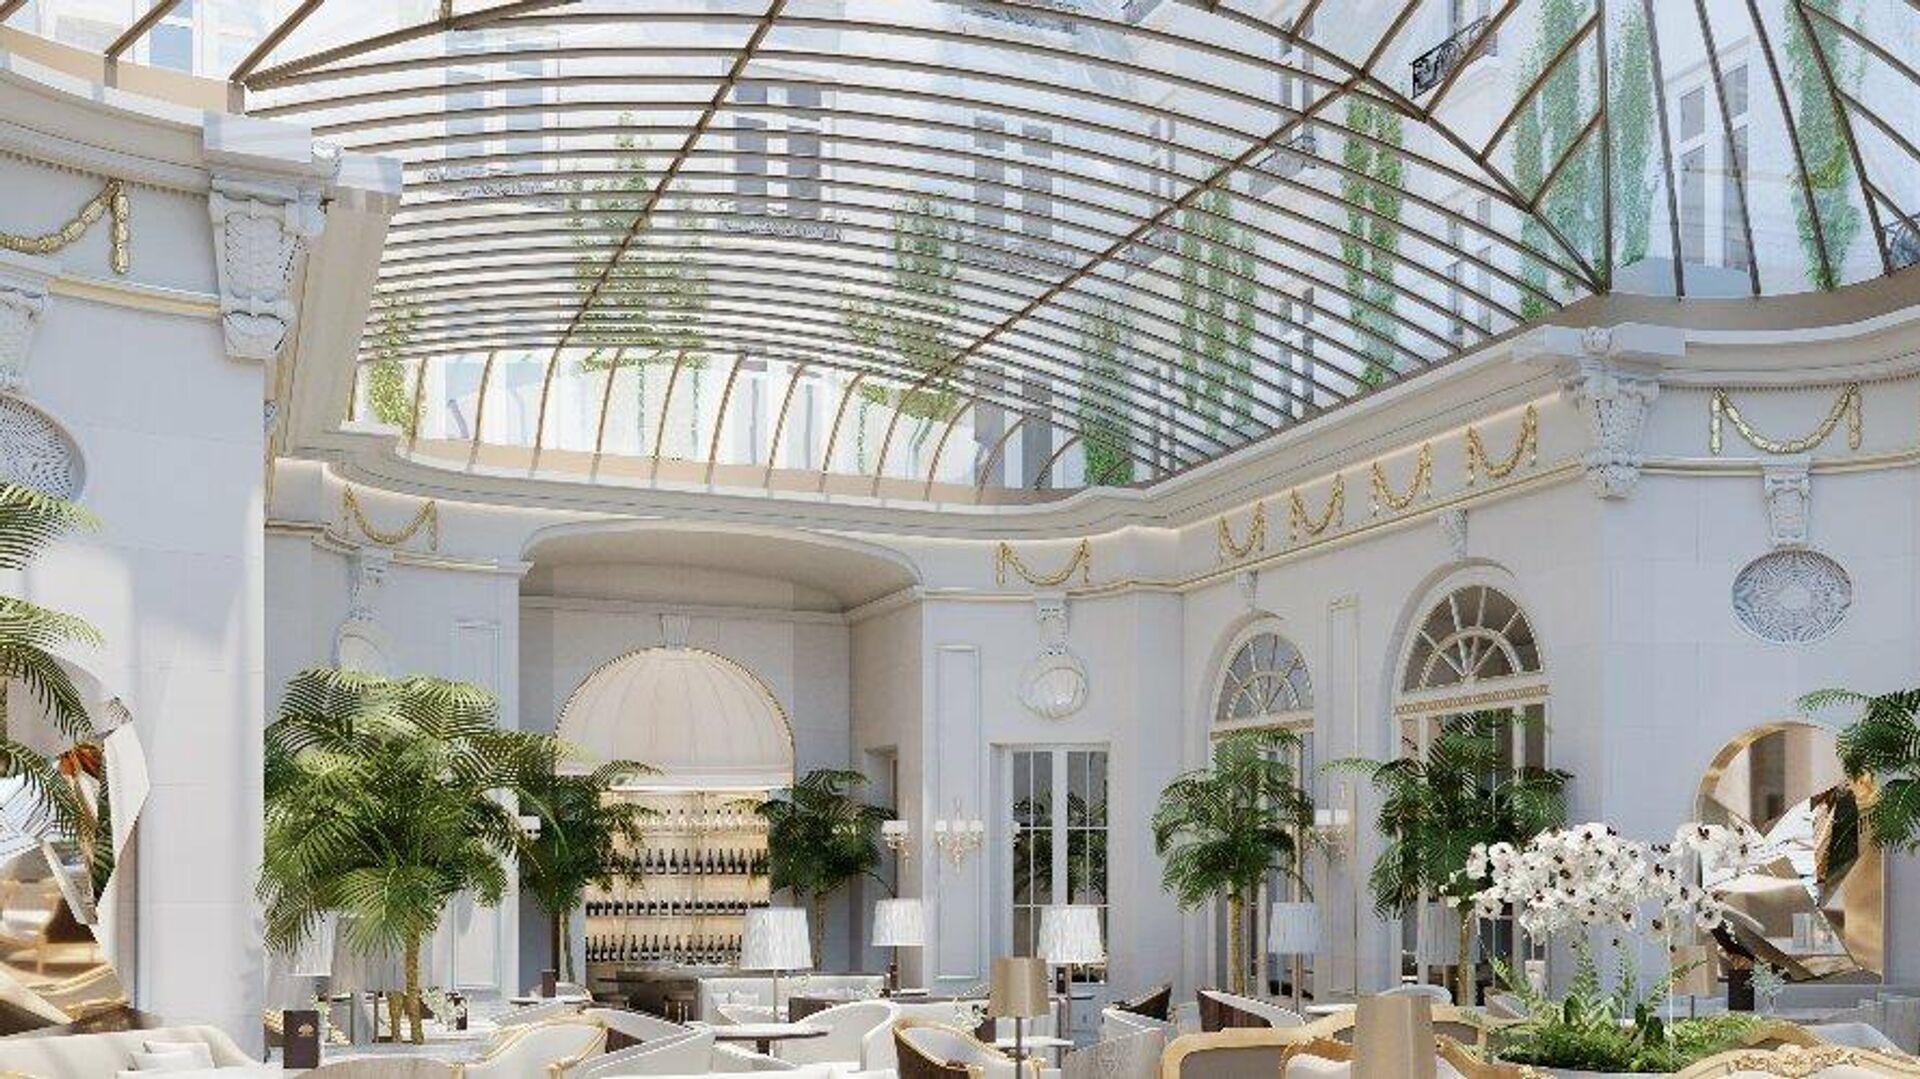 El Hotel Mandarin Oriental Ritz Madrid tras la reforma en 2021 - Sputnik Mundo, 1920, 15.04.2021